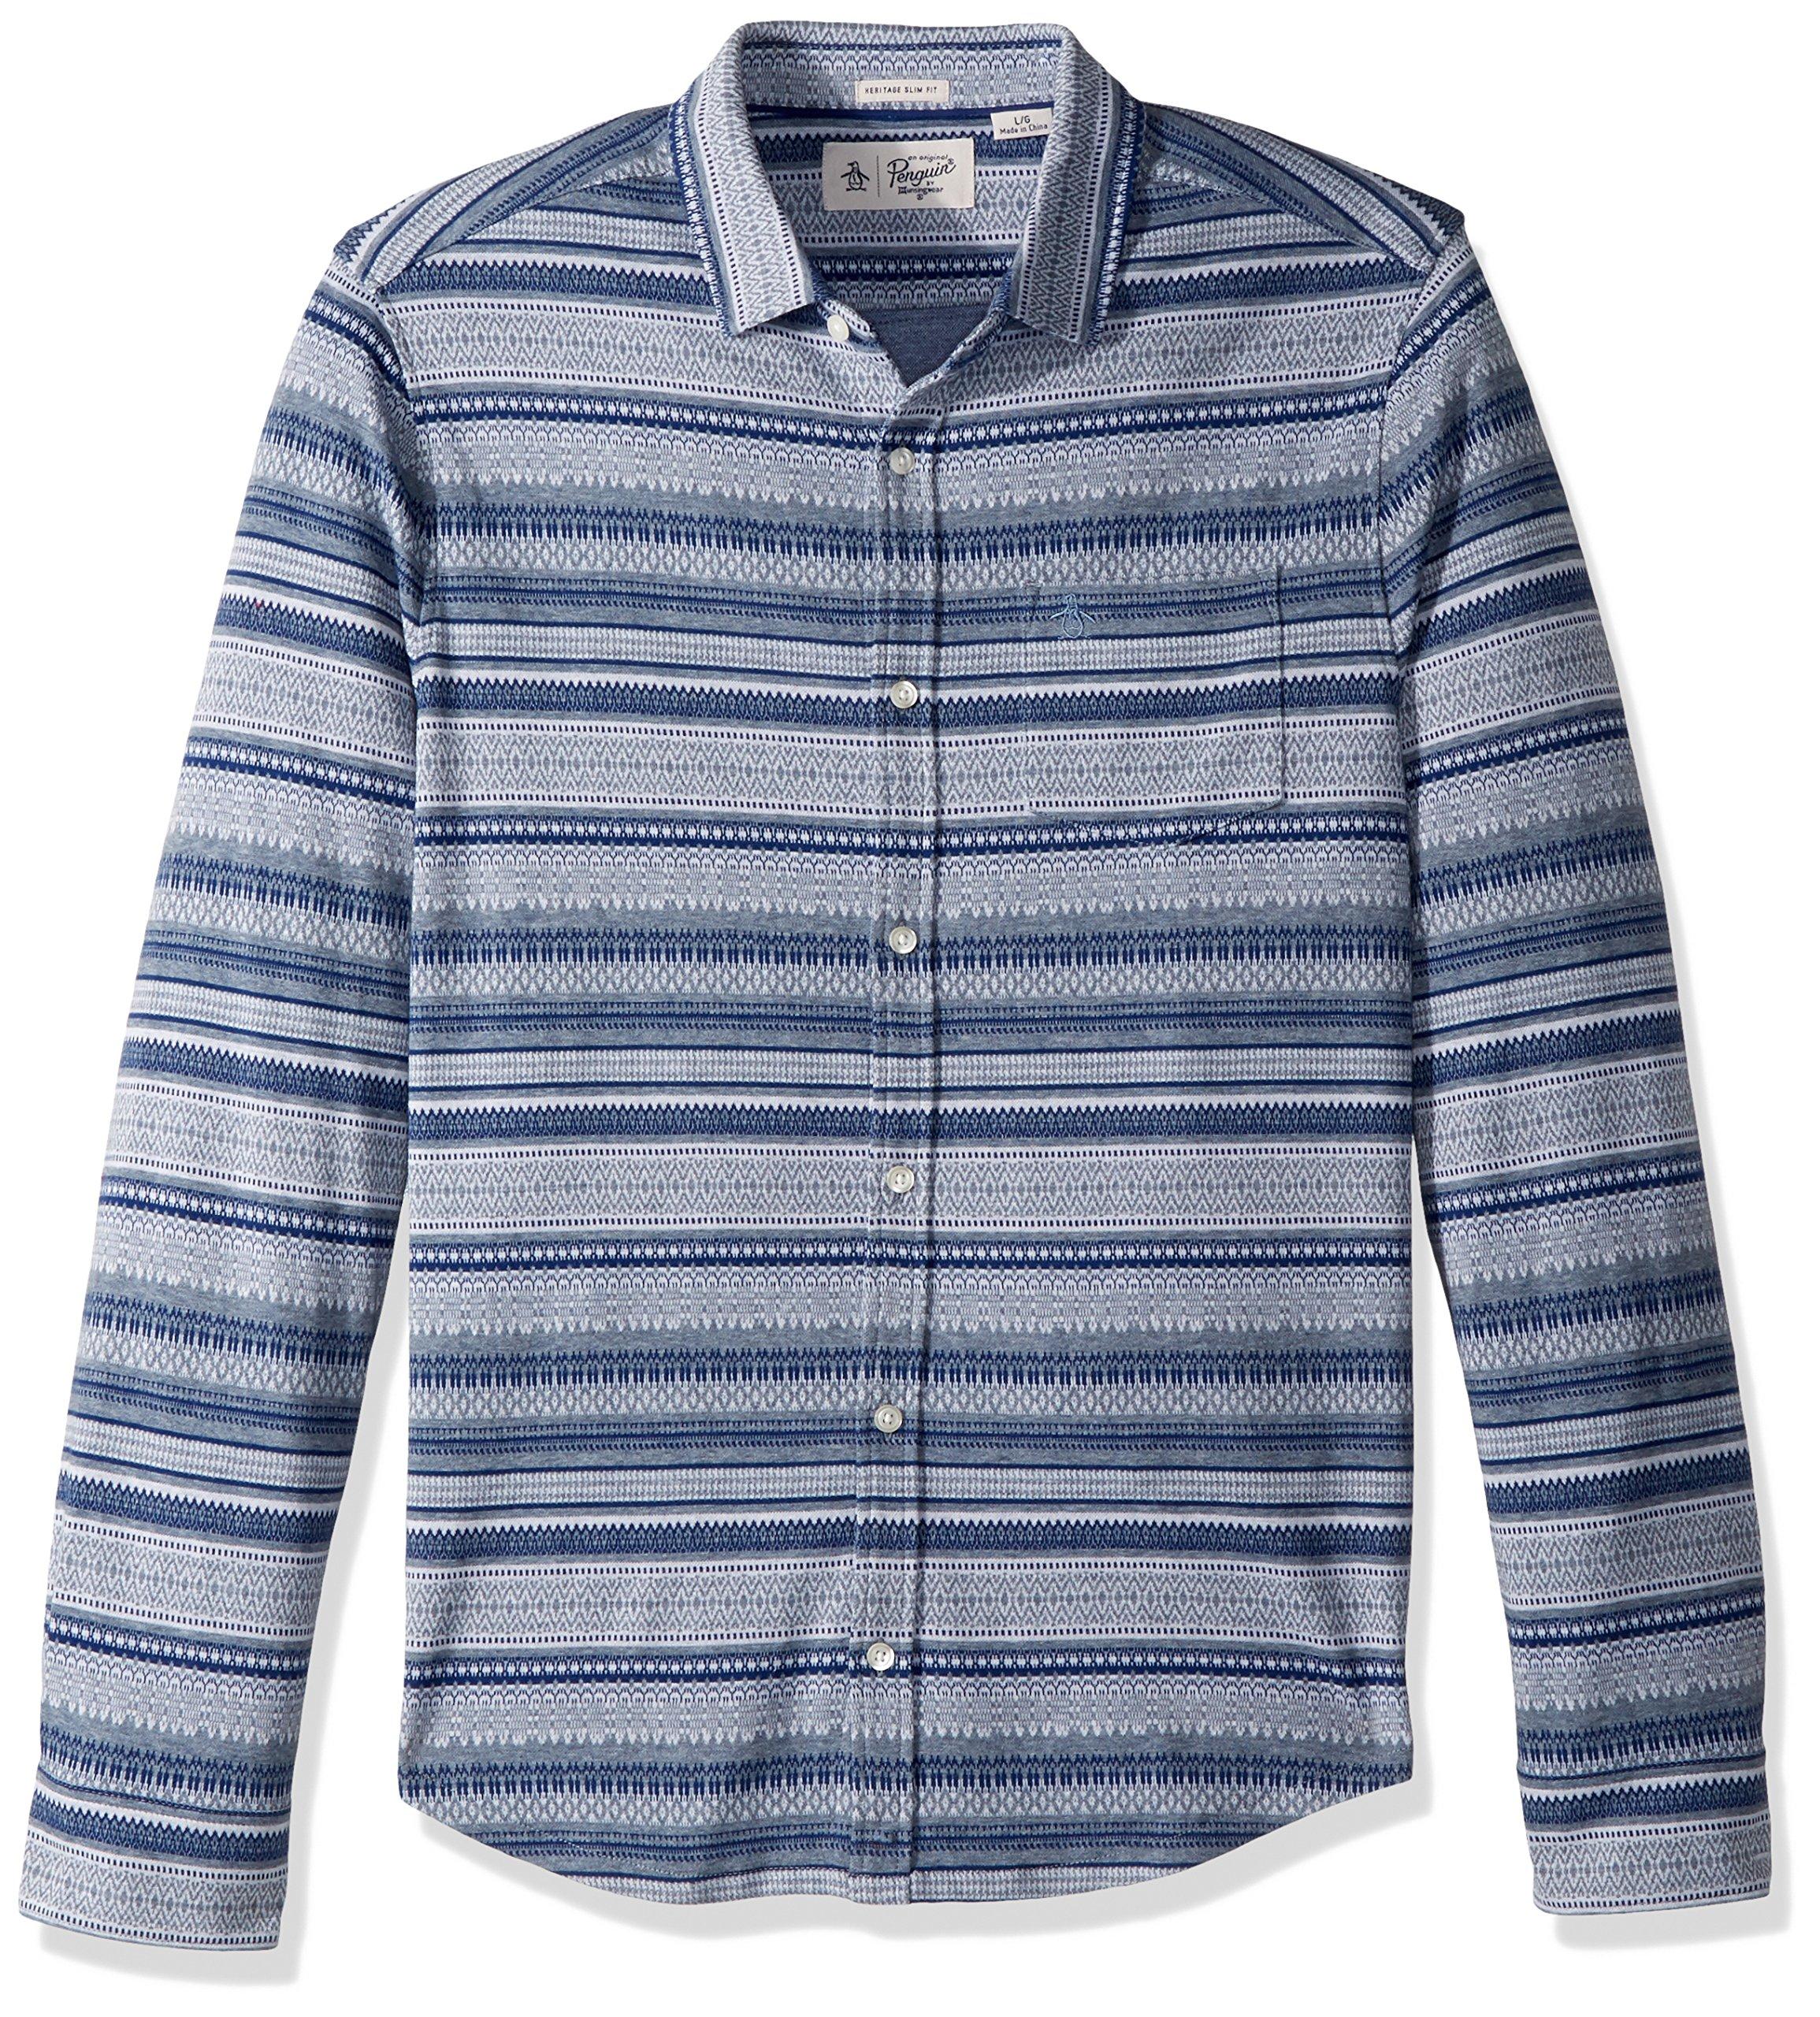 Original Penguin Men's Long Sleeve Knitted Fairisle Shirt, China Blue, Large